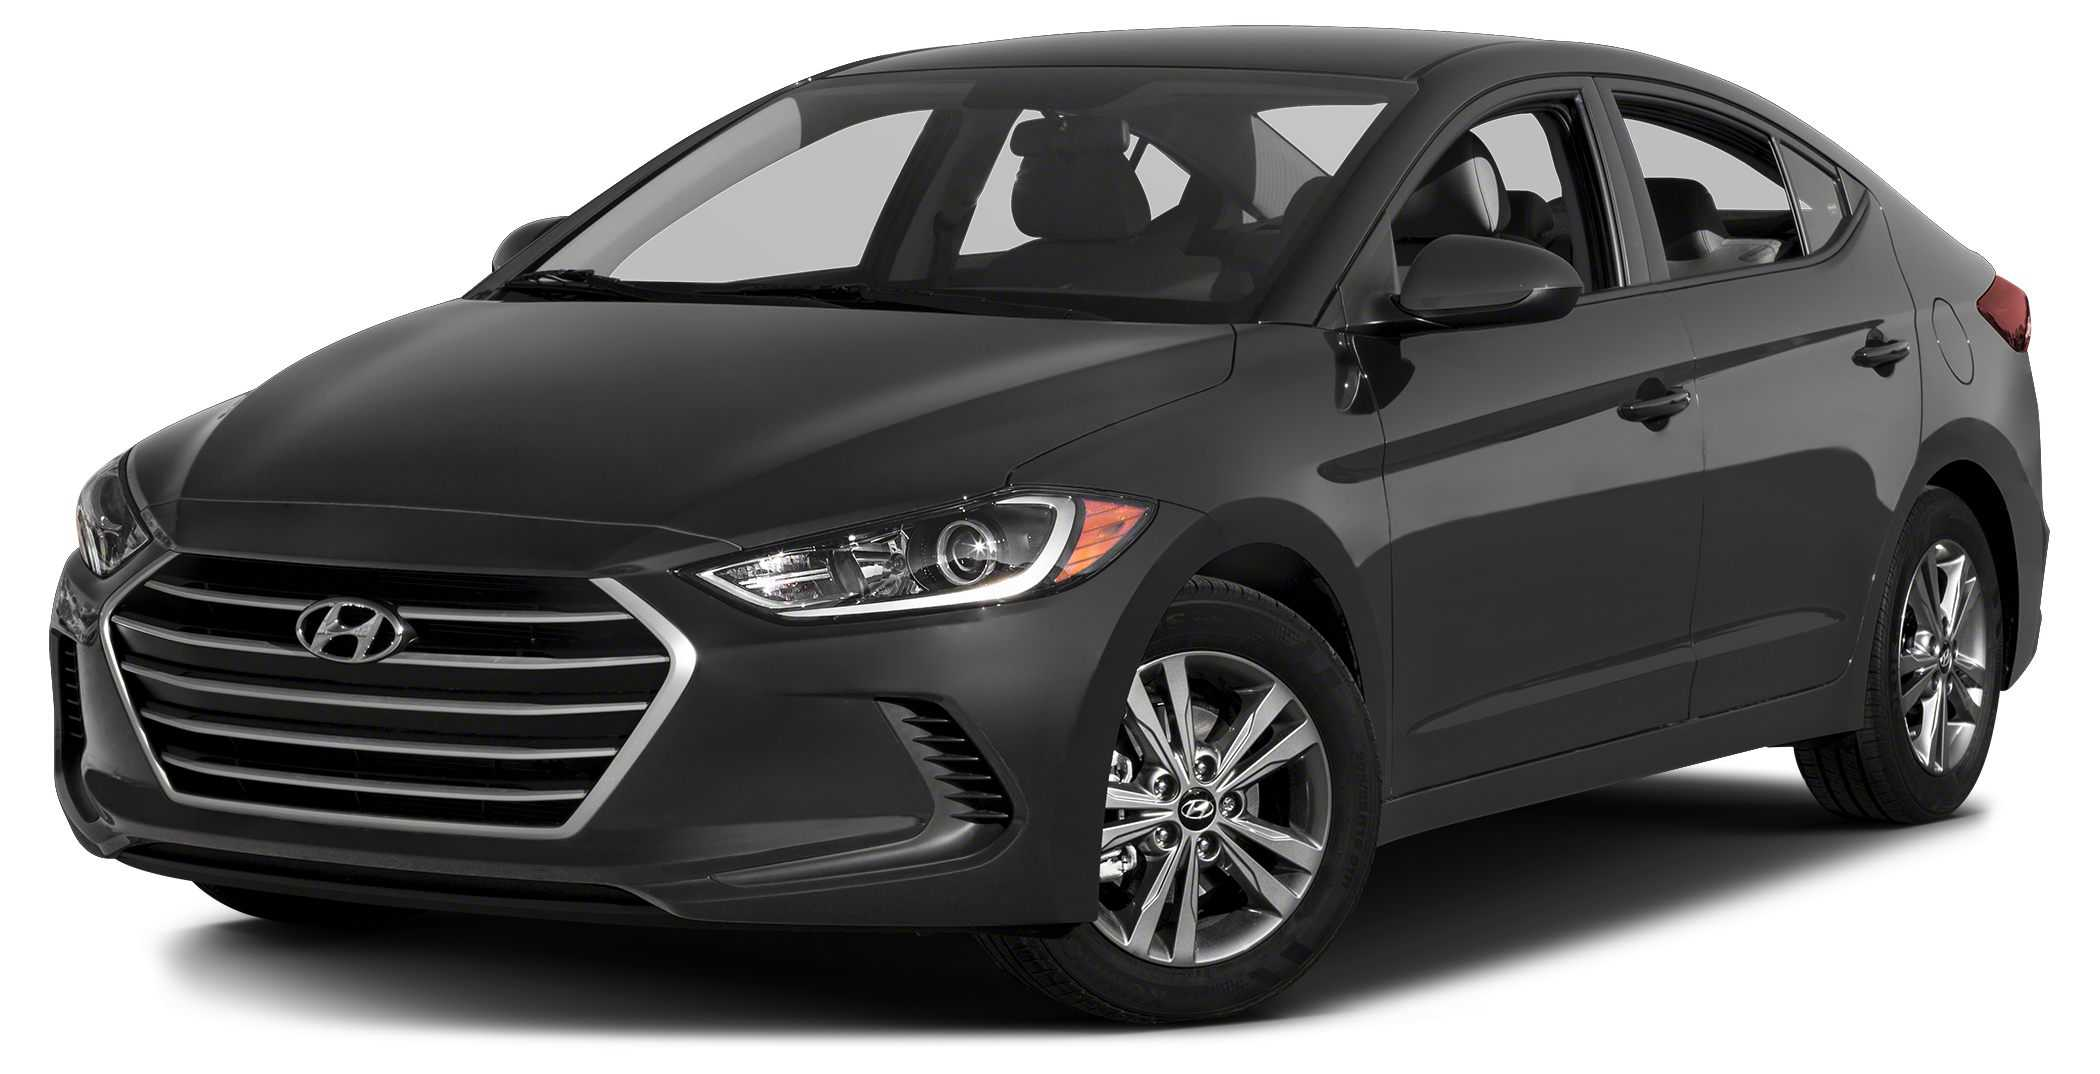 Hyundai Syracuse Ny 2018 Hyundai Elantra For Sale In